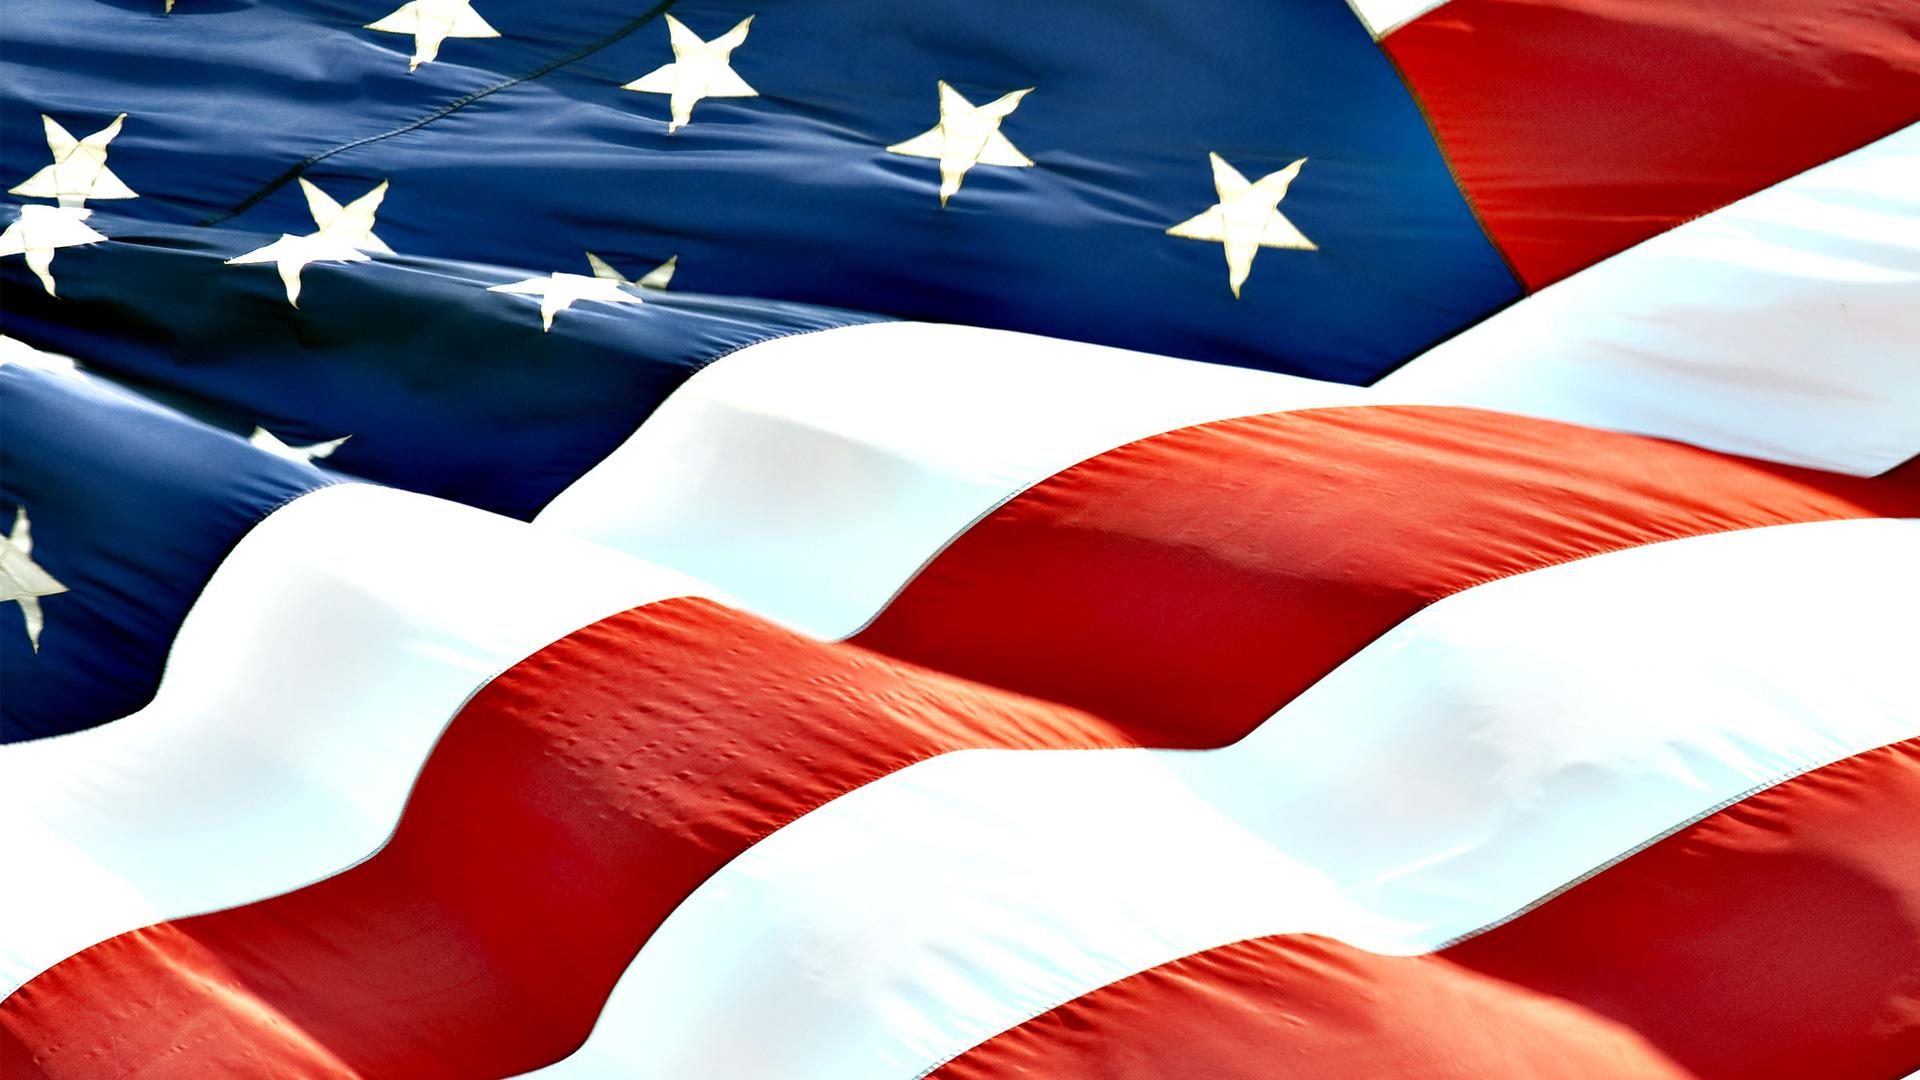 Flag Of Usa Pics Wallpapers 2017 My Site